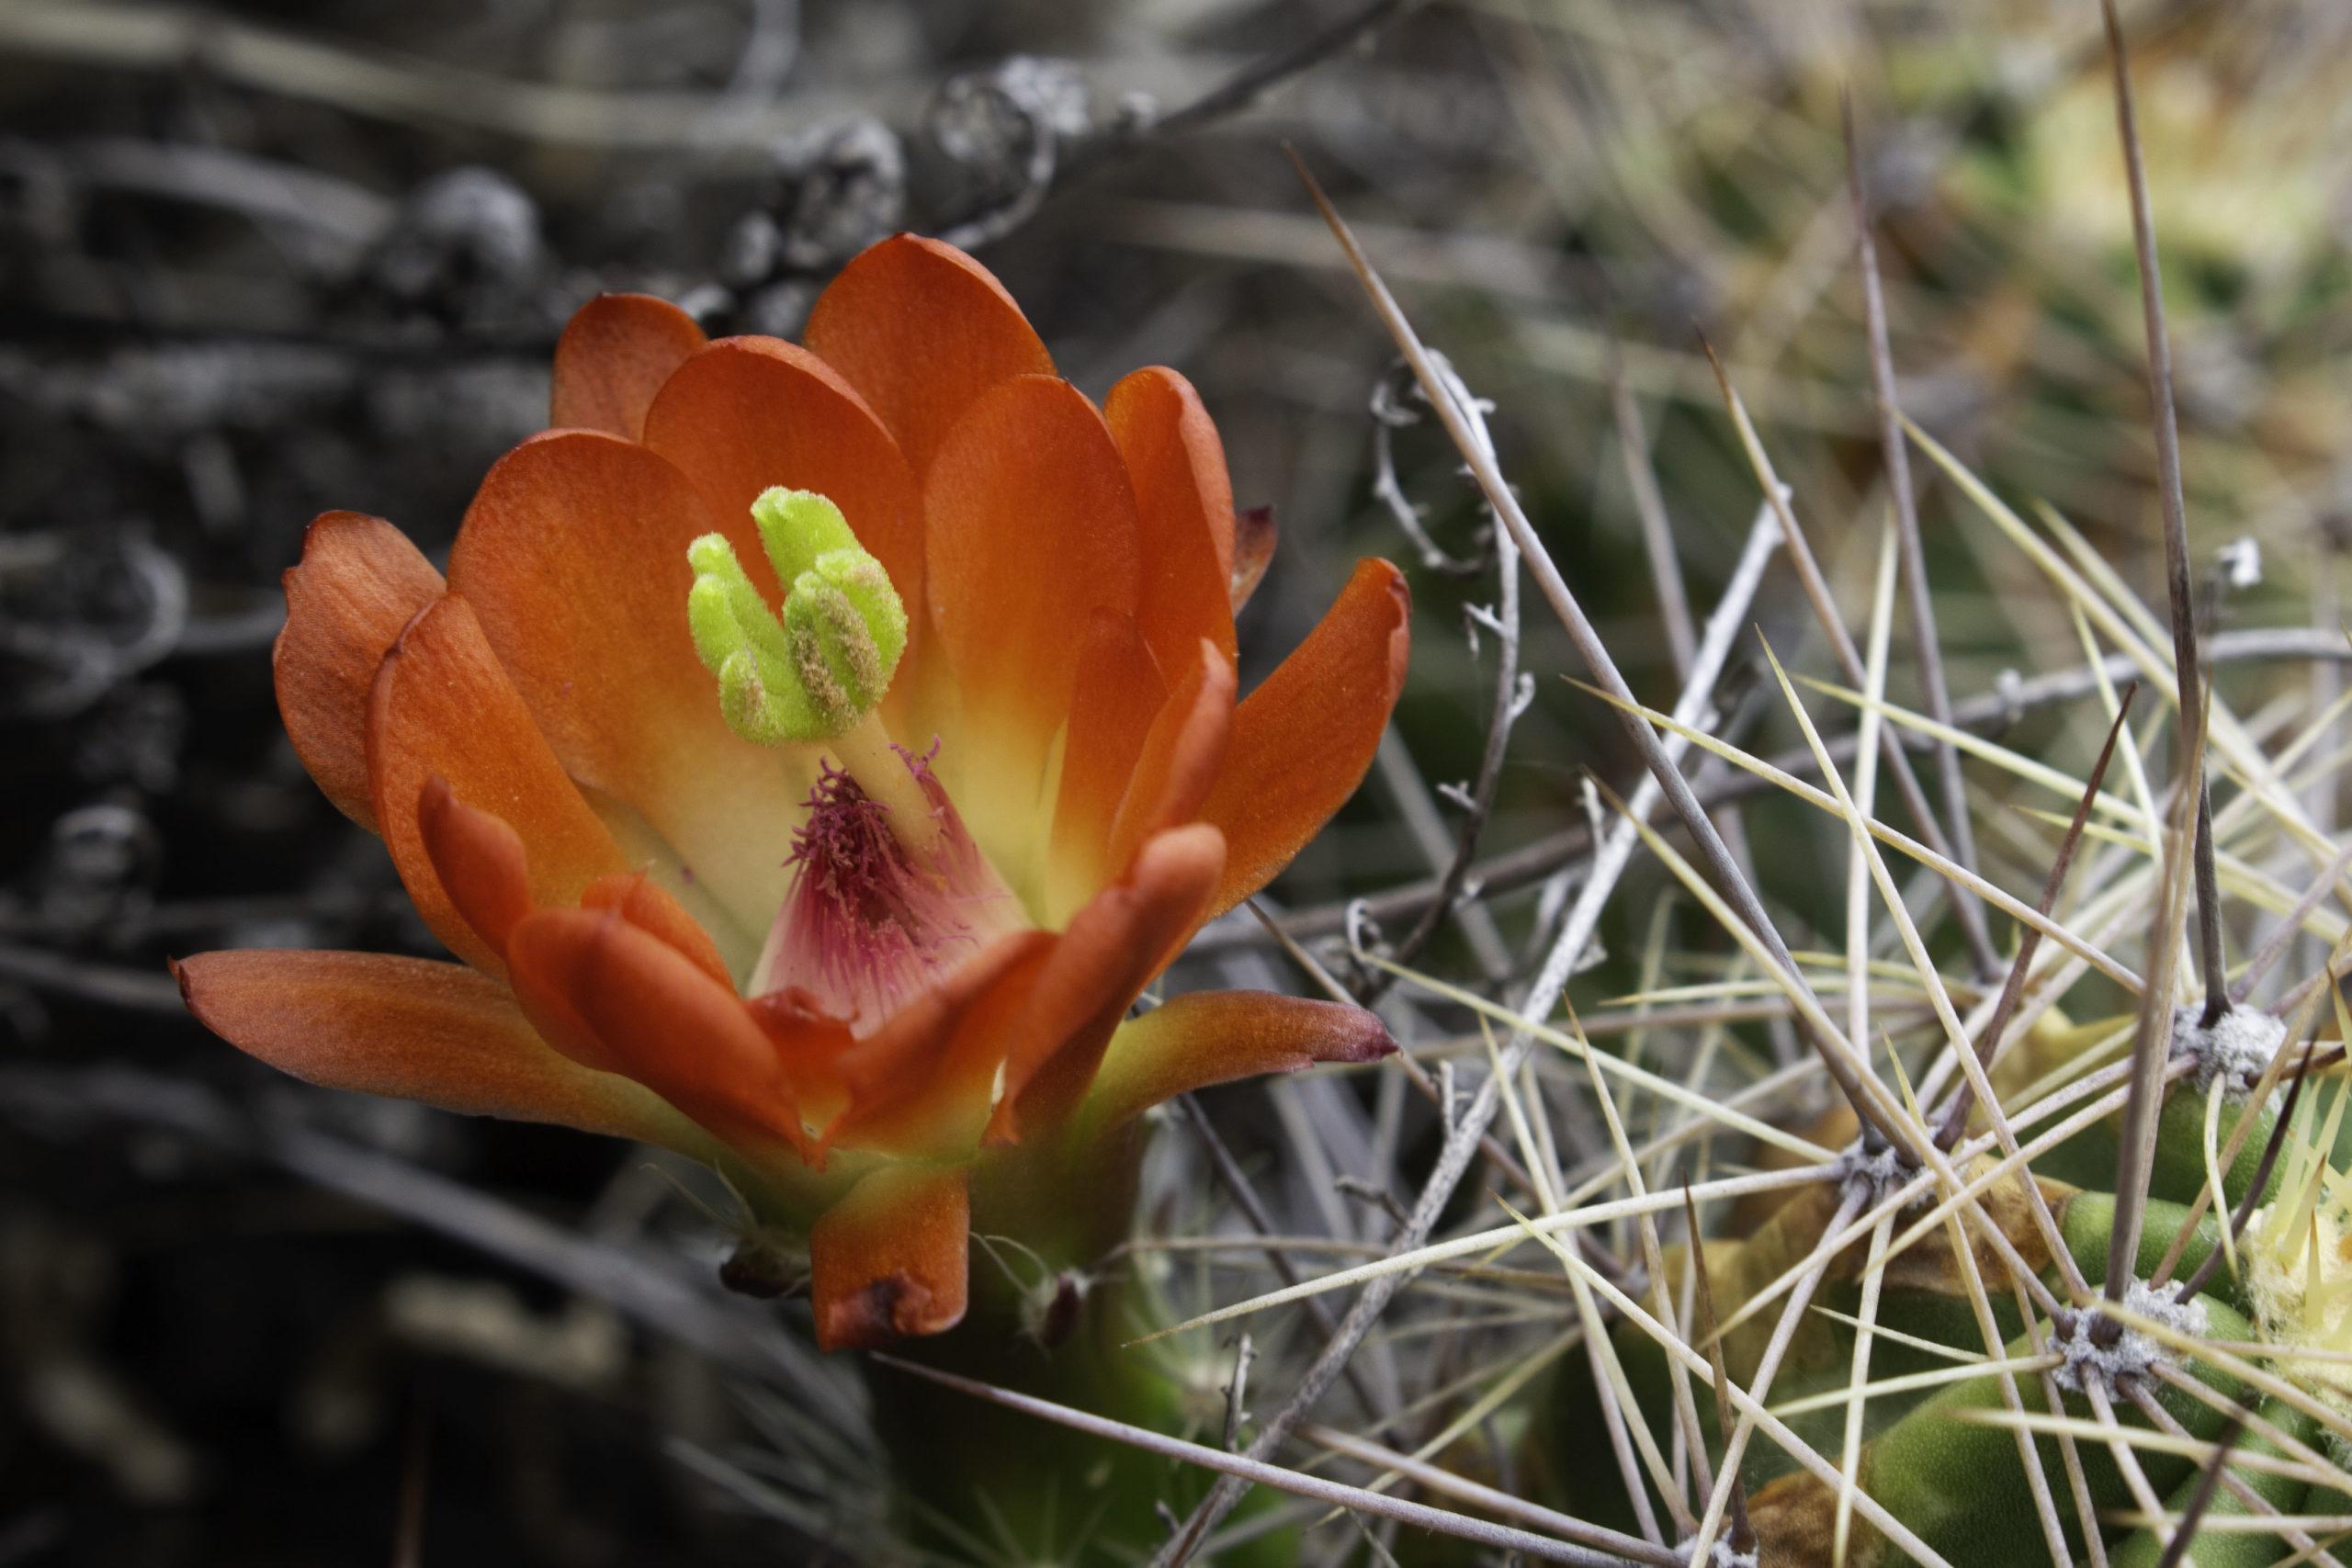 Texas Wildflowers 2020 – 2021